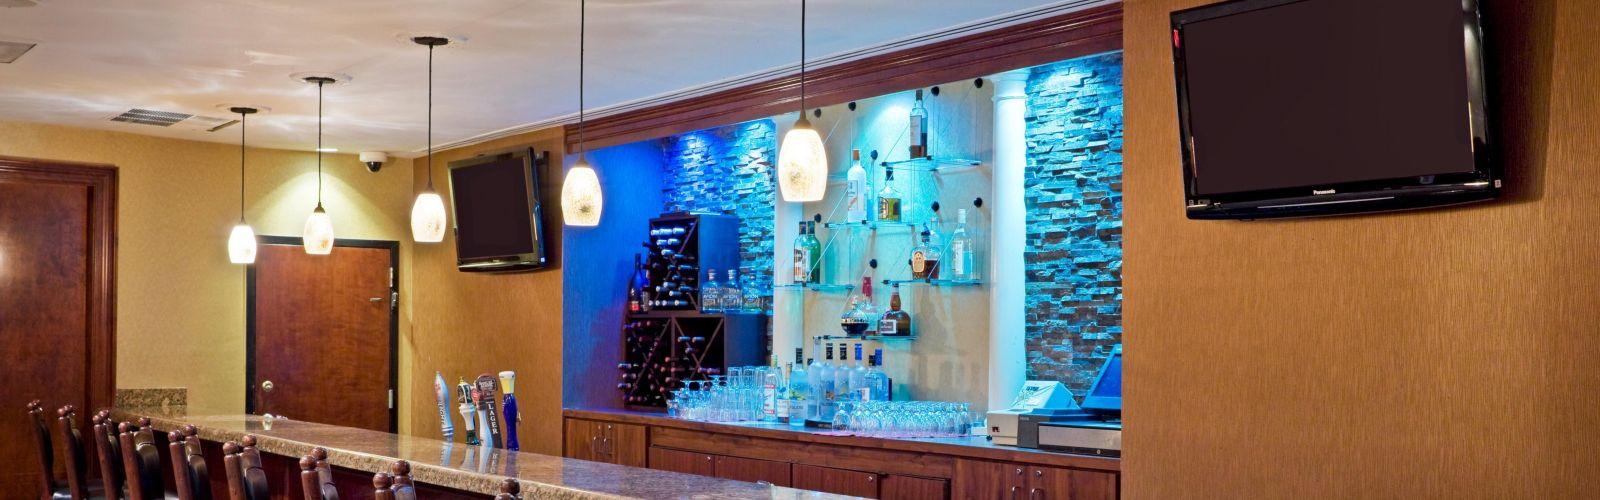 Bar and lounge photo